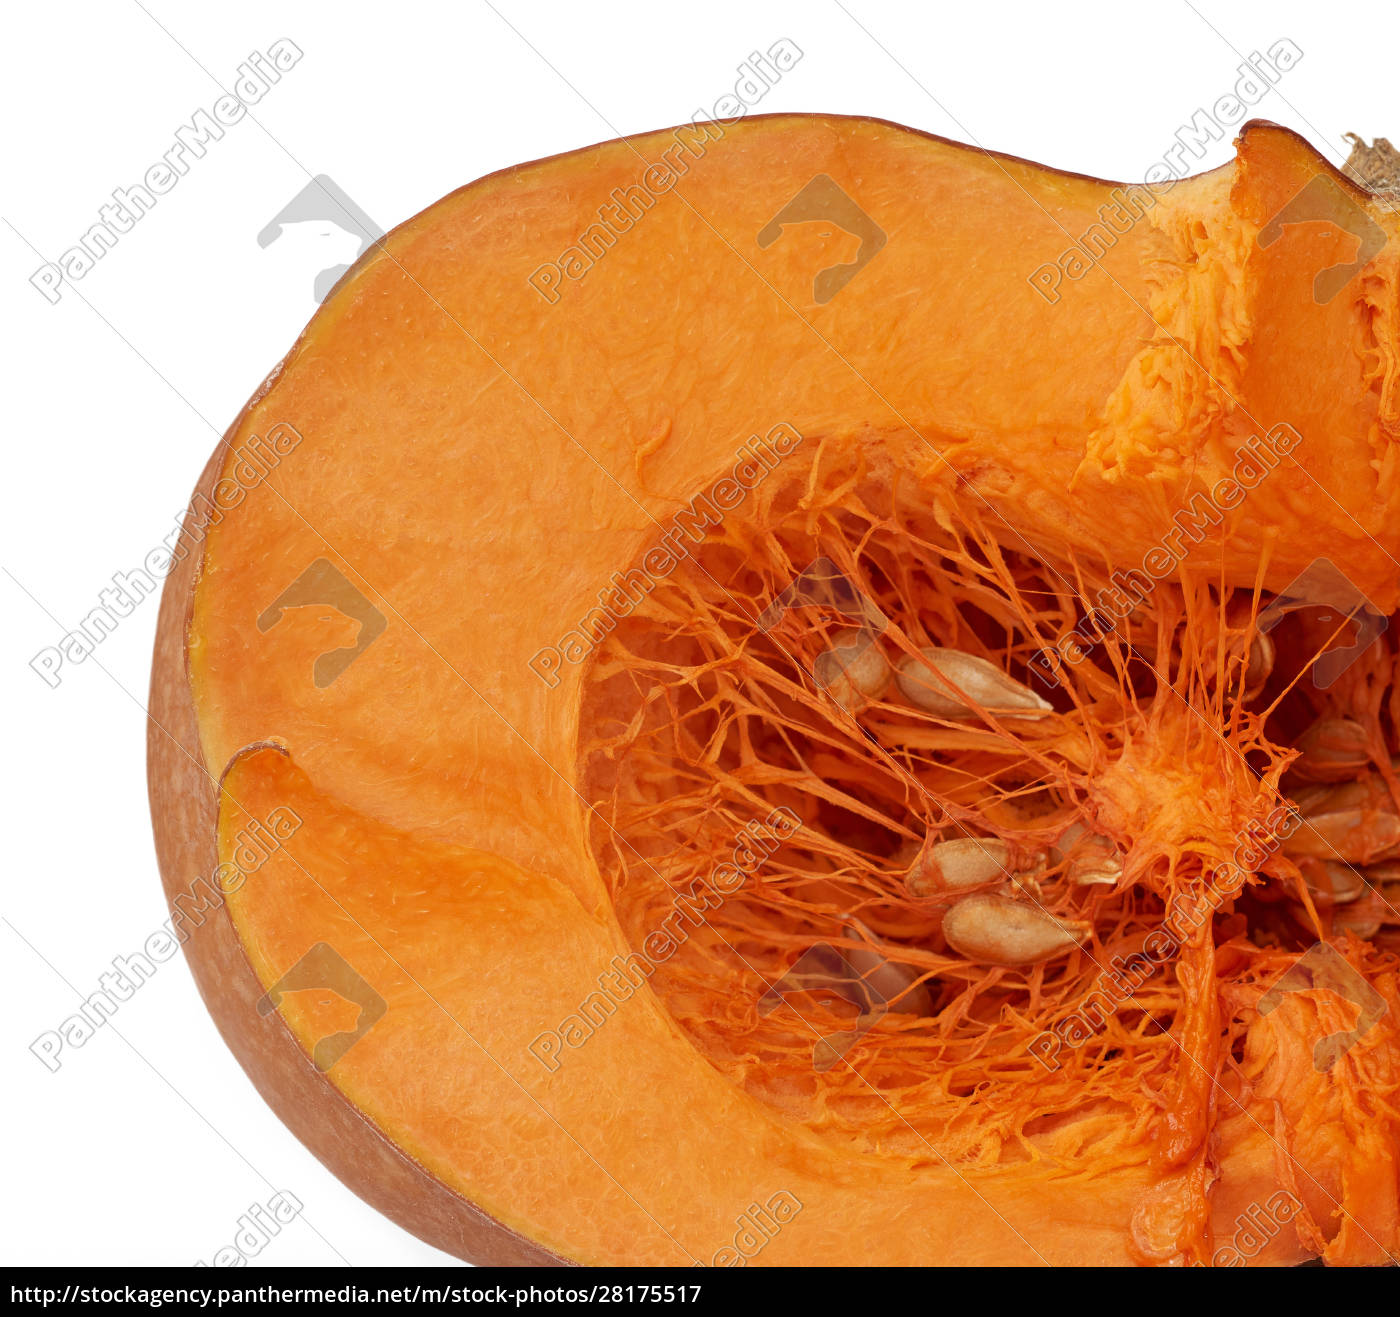 halved, big, orange, pumpkin, with, seeds - 28175517